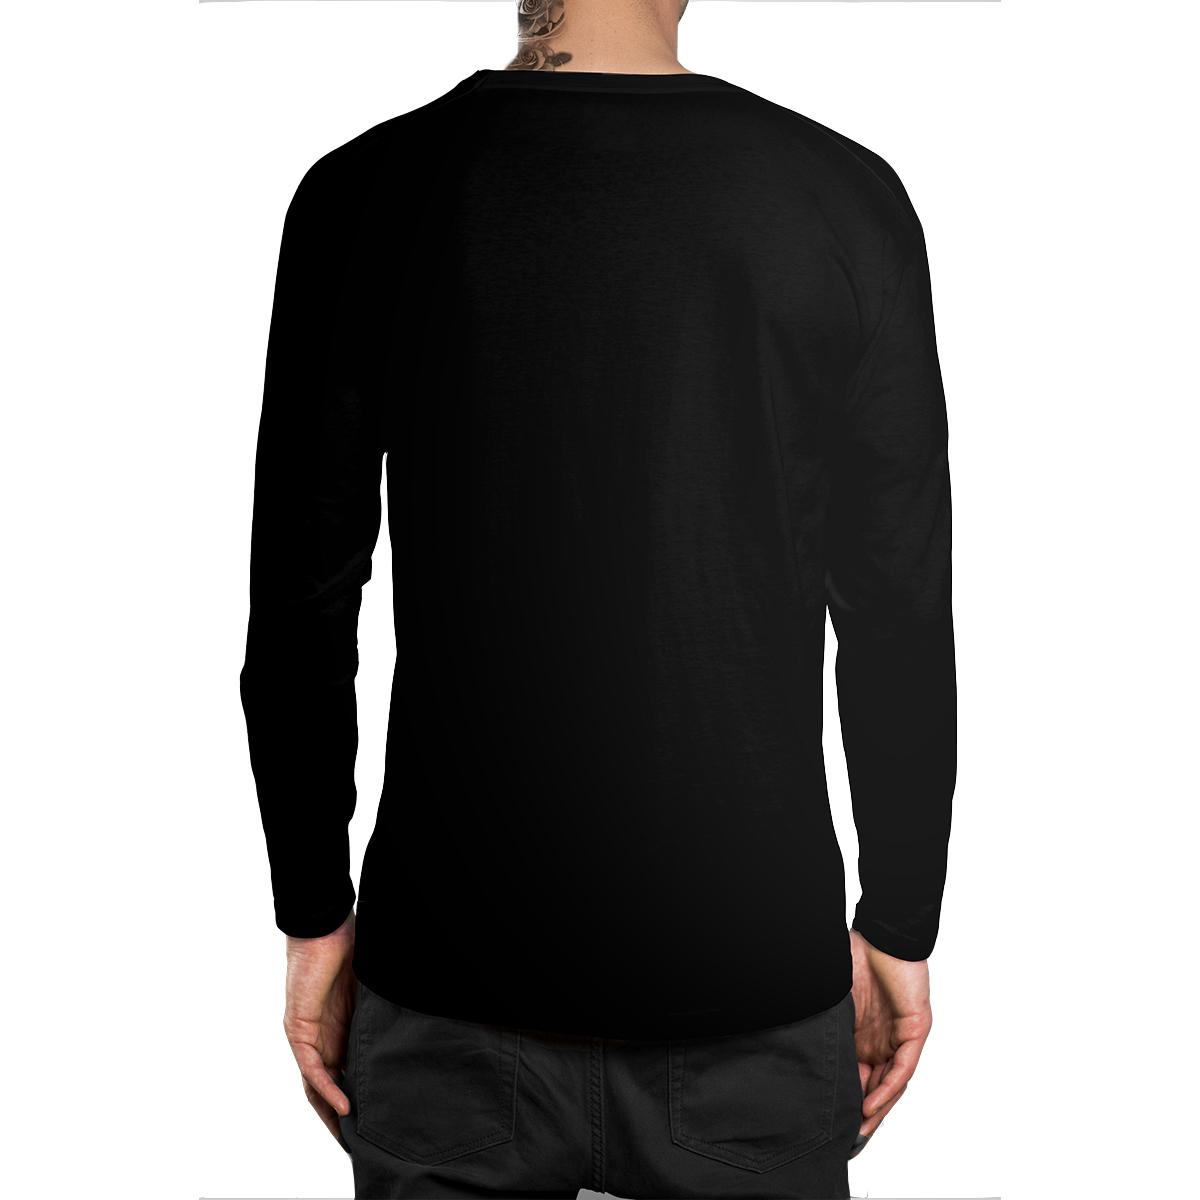 Stompy Camiseta Manga Longa Modelo 31